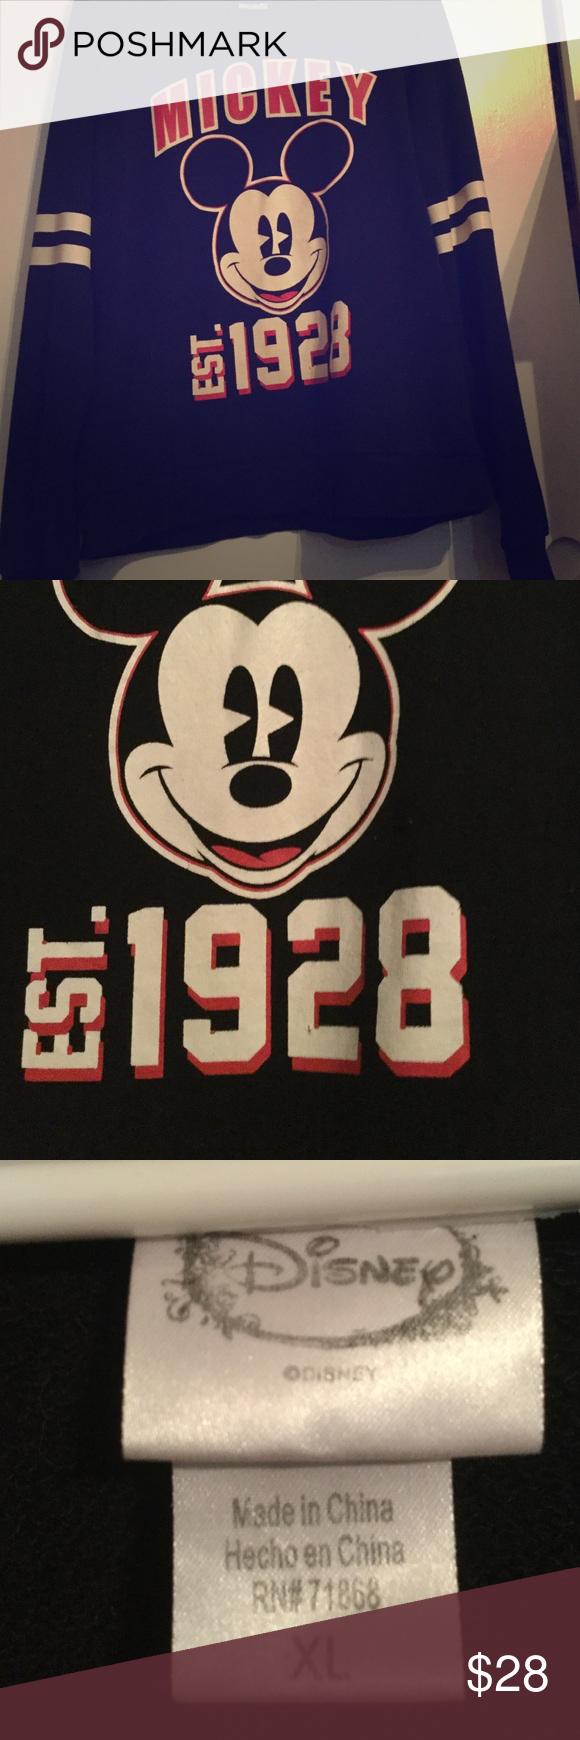 Mickey Mouse Sweater Mickey Mouse Sweater. Size XL. Worn a handful of times, but still in good shape. Disney Sweaters Crew & Scoop Necks